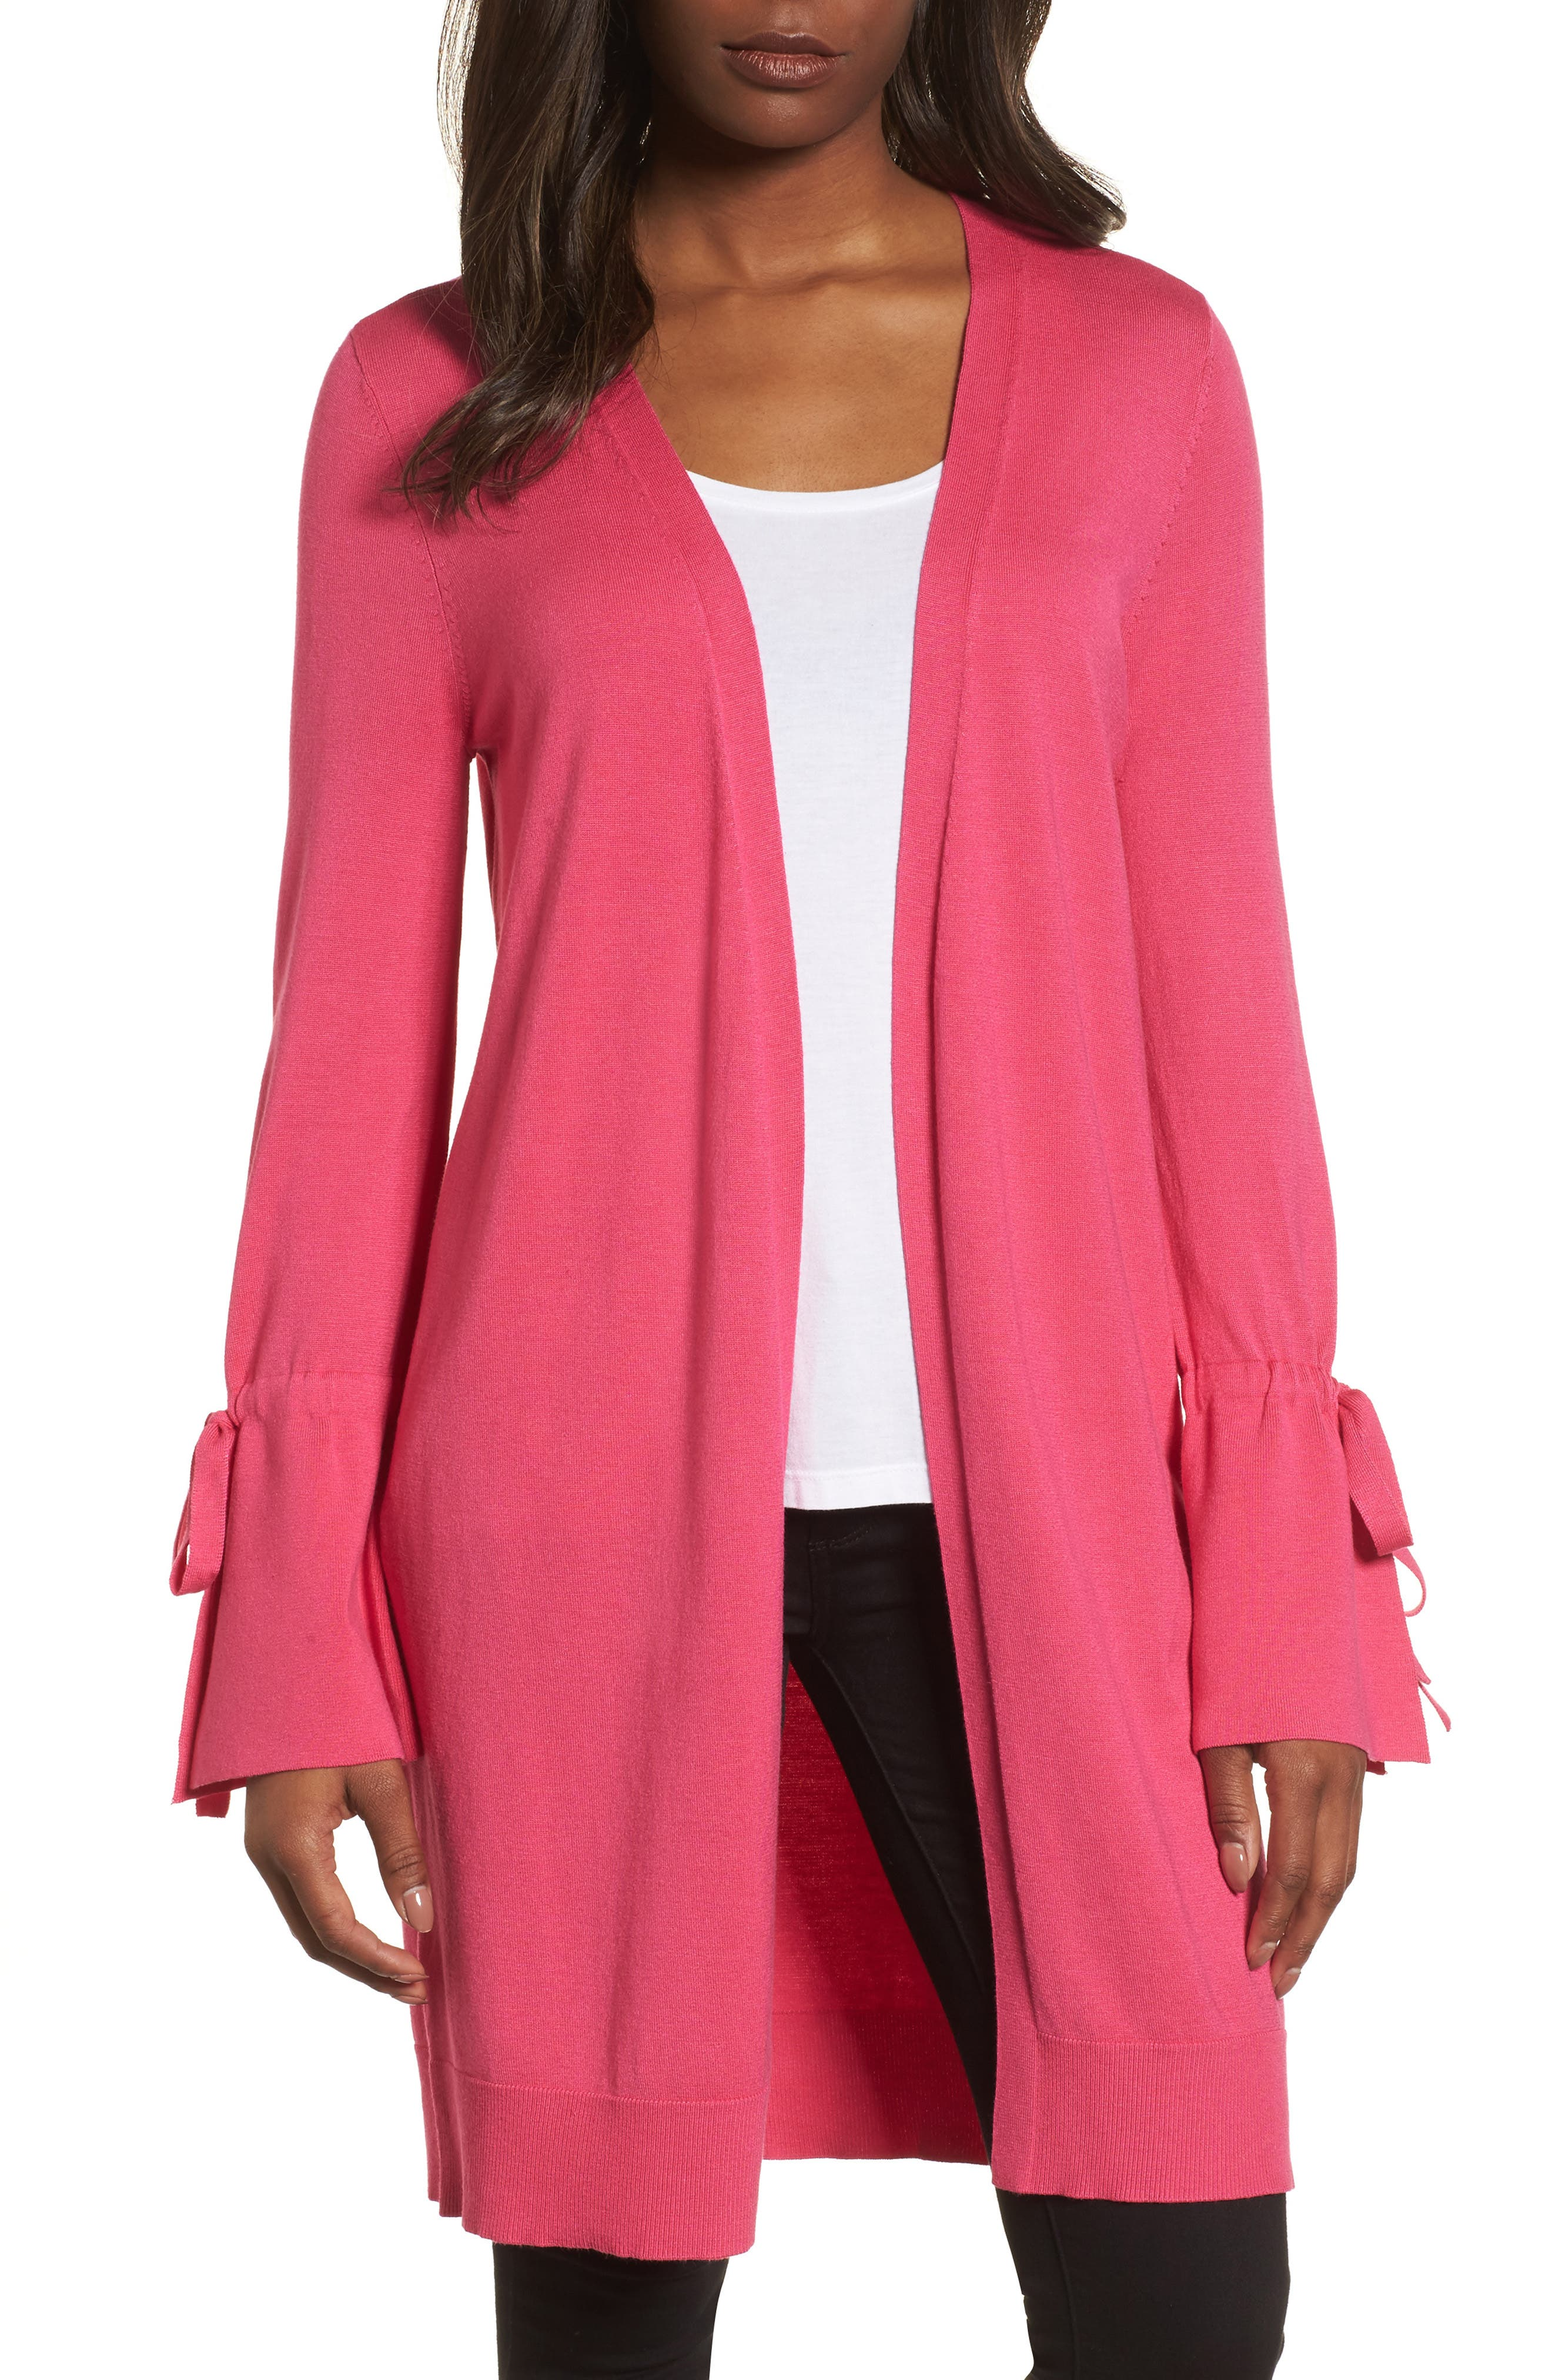 Lightweight Tie Sleeve Cardigan,                         Main,                         color, Pink Cabaret